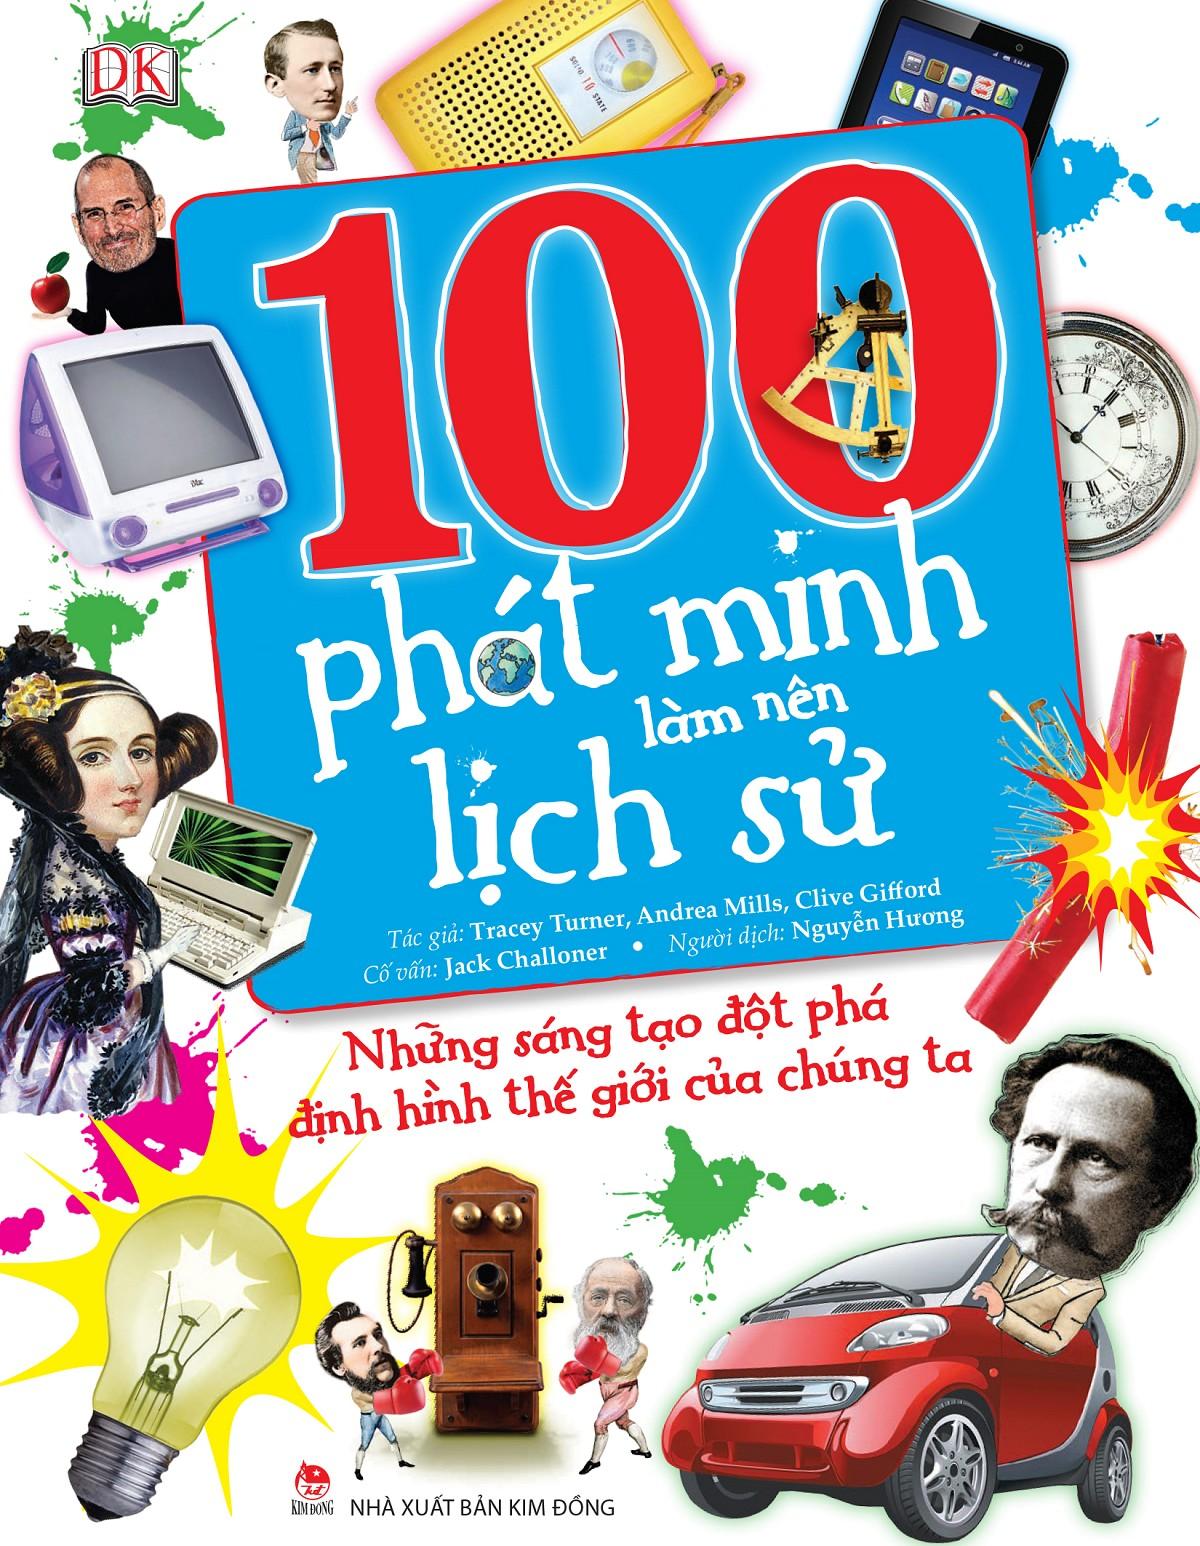 100-phat-minh-lam-nen-lich-su-1-.u84.d20161104.t151733.468956.jpg